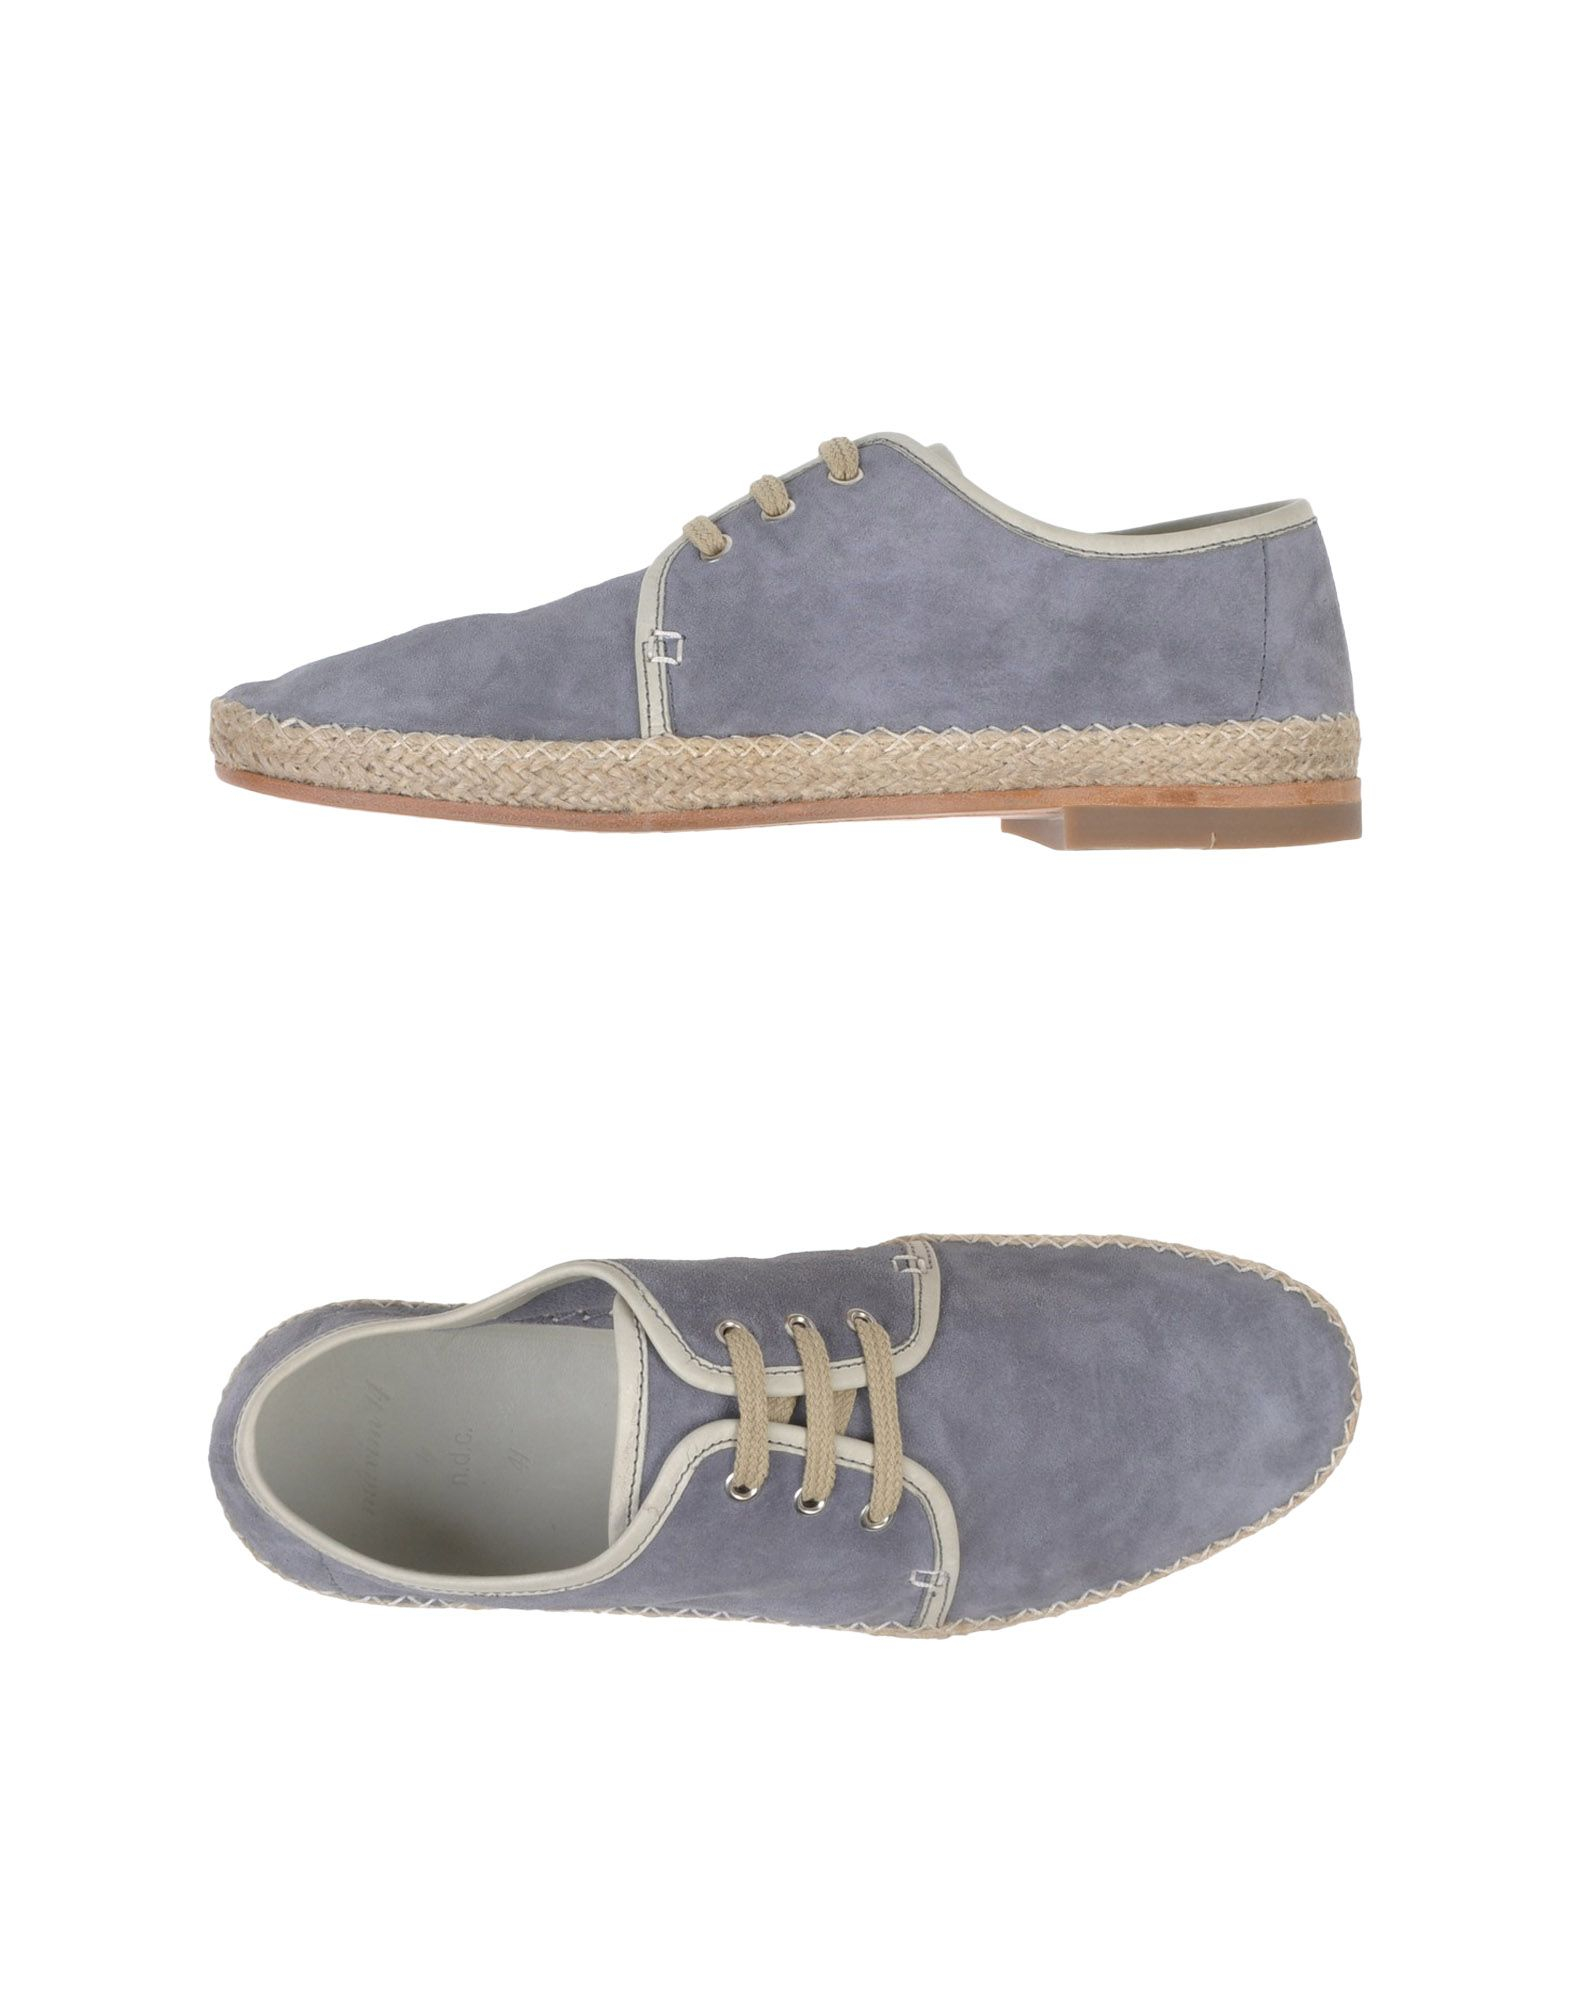 NDC Espadrilles in Slate Blue (Grey) for Men